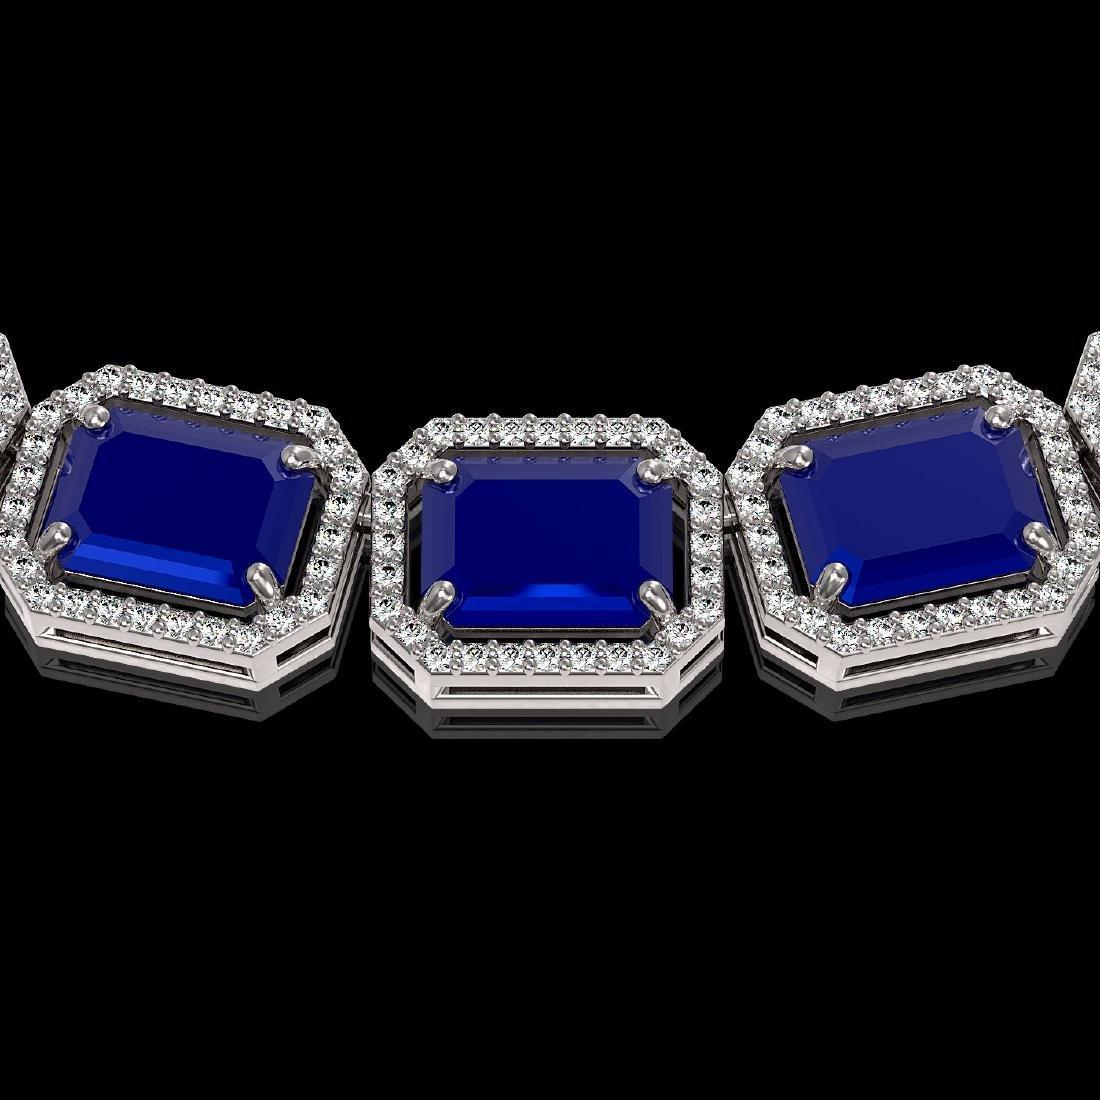 84.94 CTW Sapphire & Diamond Halo Necklace 10K White - 3